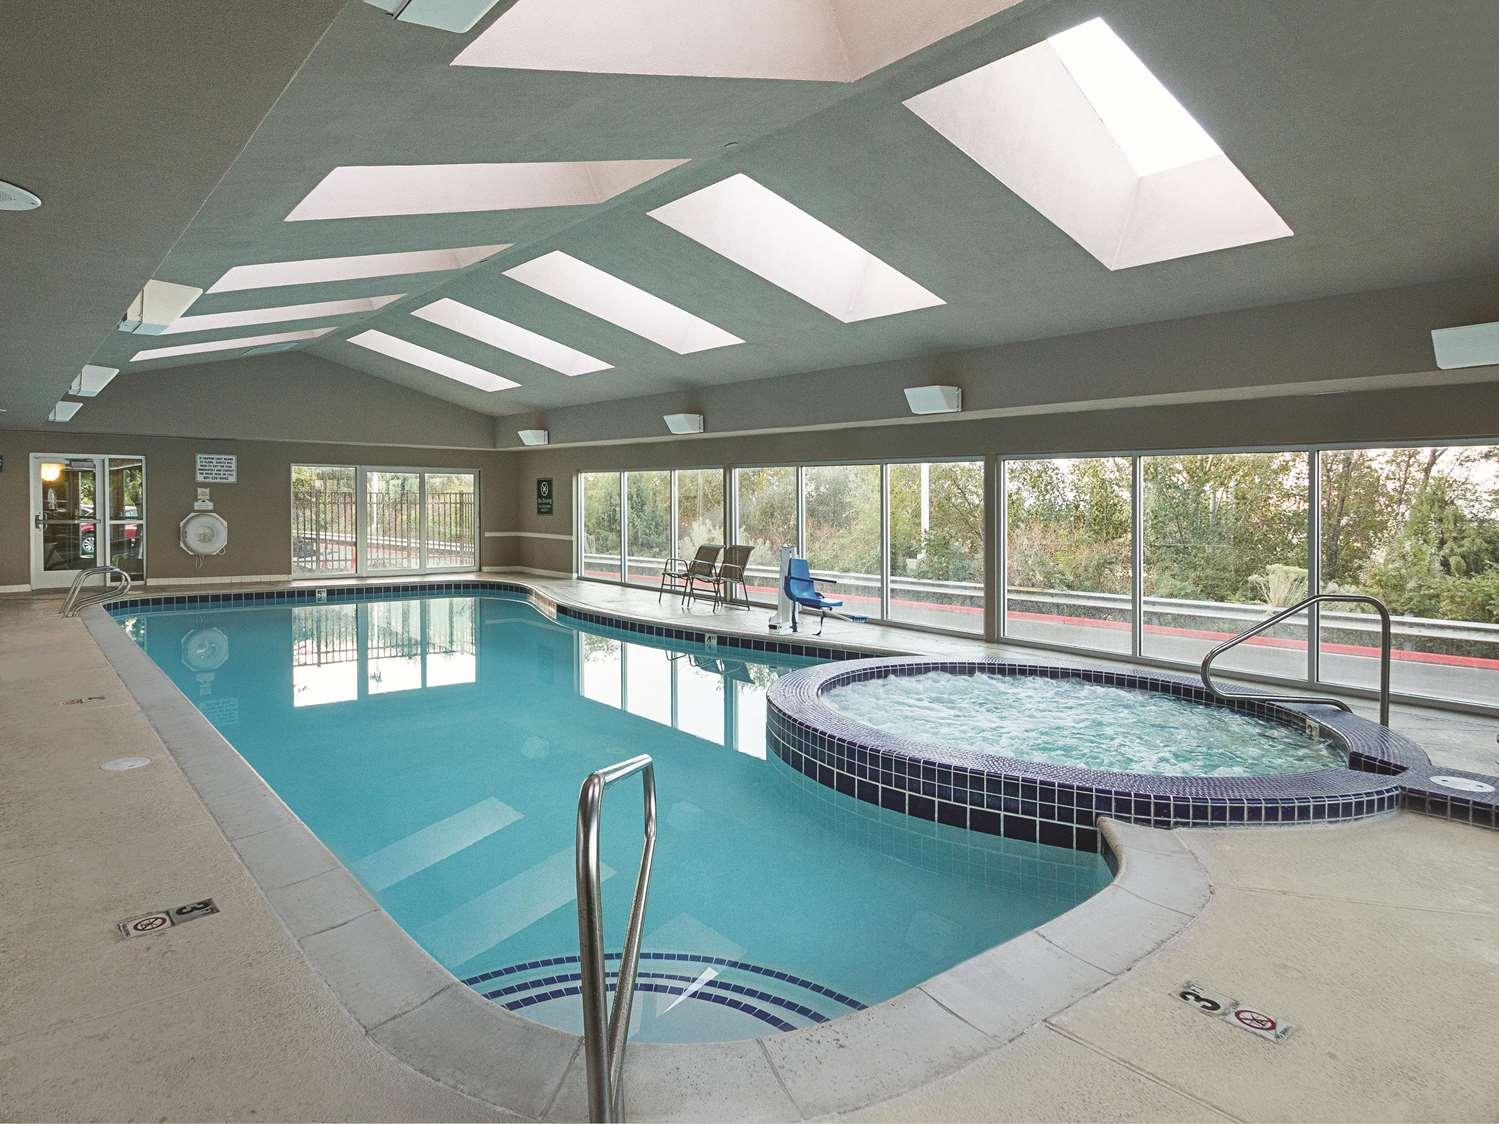 Pool - La Quinta Inn & Suites Orem